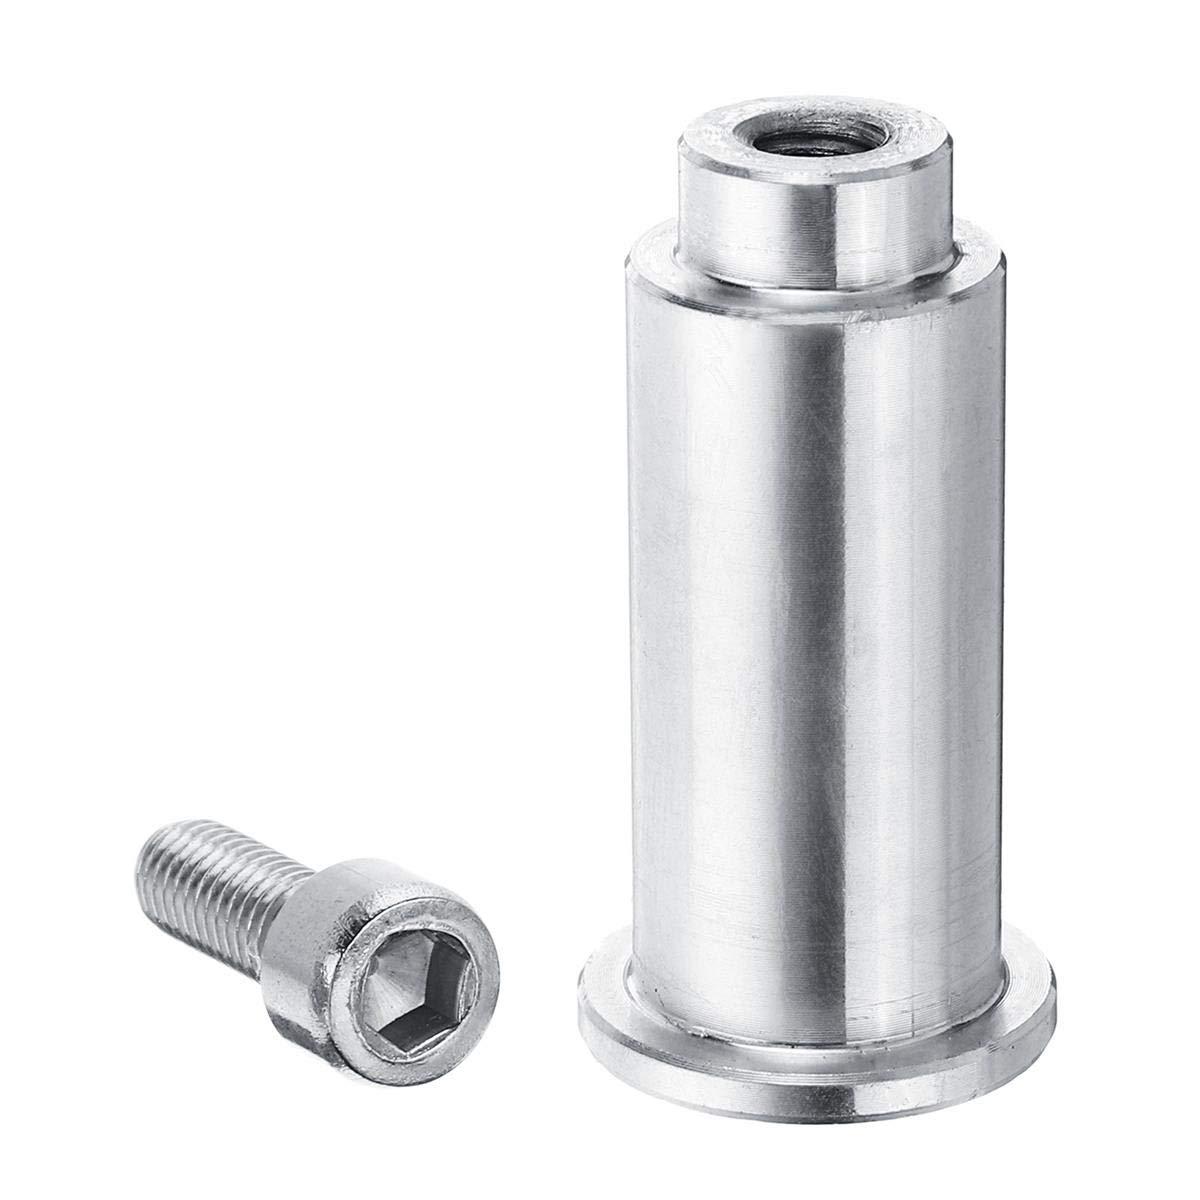 Gavita-Star - 1x New Durable Gear Selector Repair Kit Pin For BMW Mini R50 Getrag Gearbox Fix Stiff Manual 621-126061